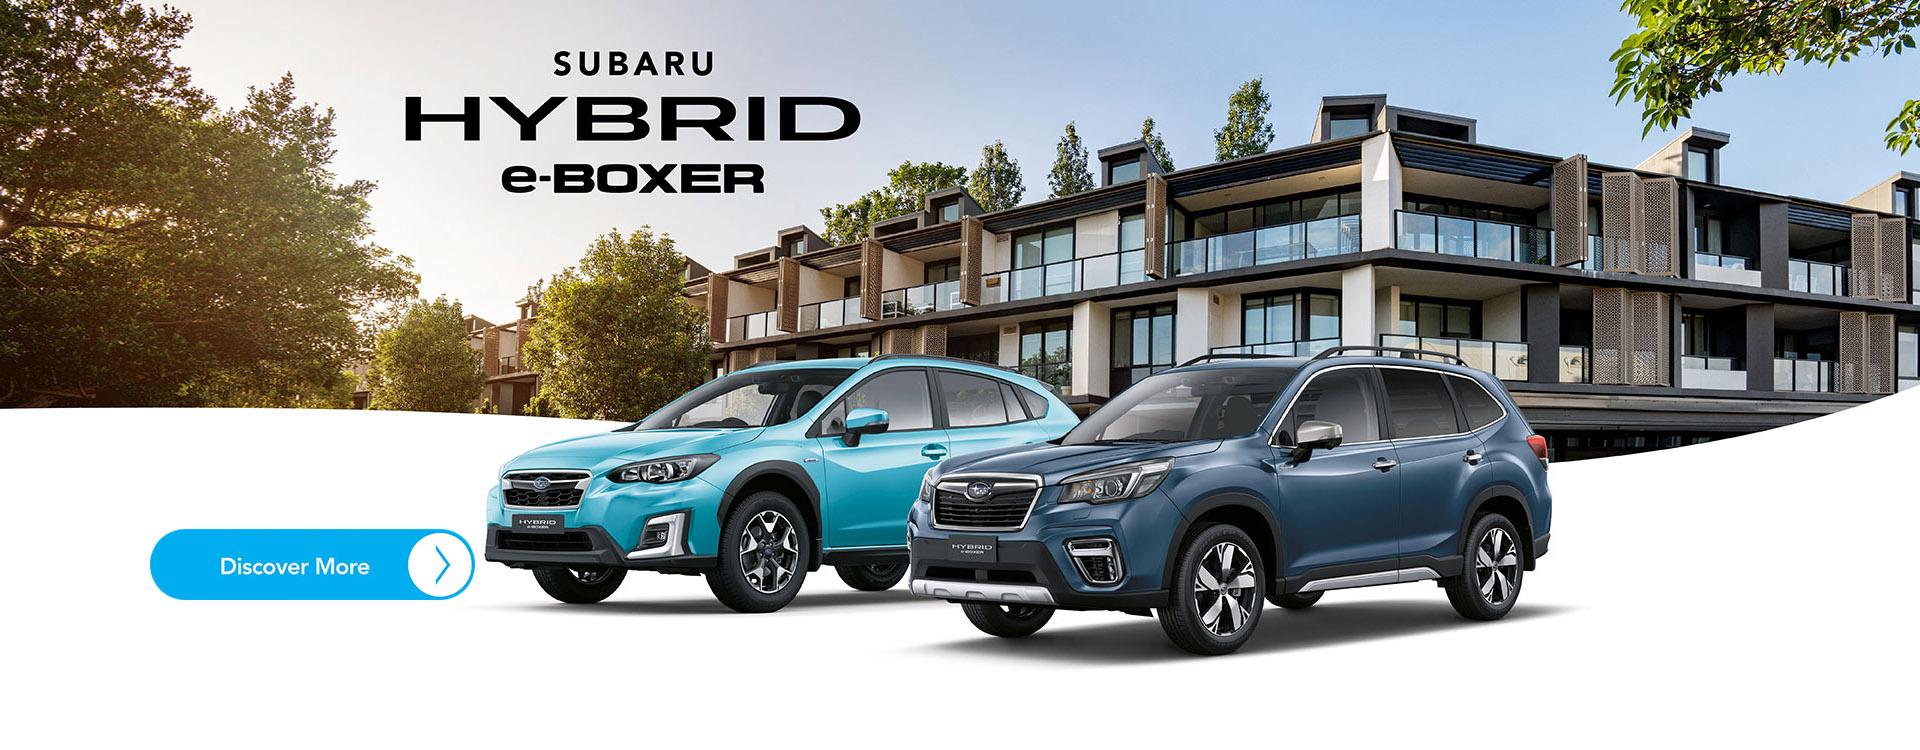 Subaru E-Hybrid Boxer